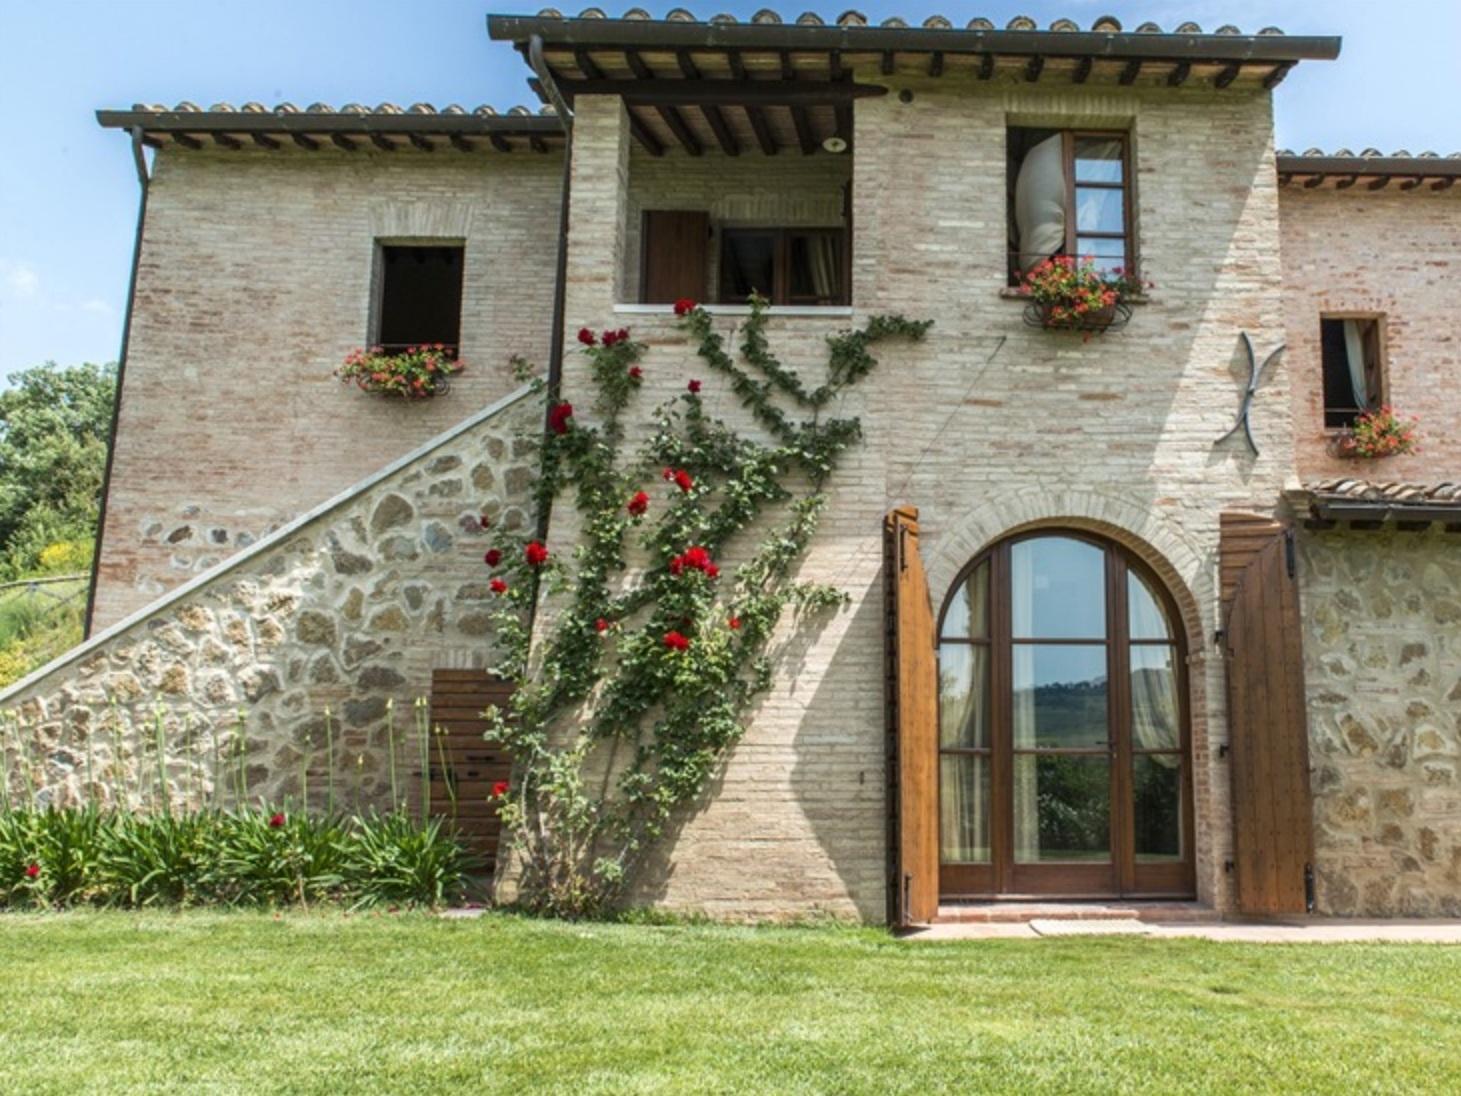 CASA MONTEPULCIANO - MONTEPULCIANO - 3 BEDROOMS - 3 BATHWEEKLY PRICE FROM €2,400